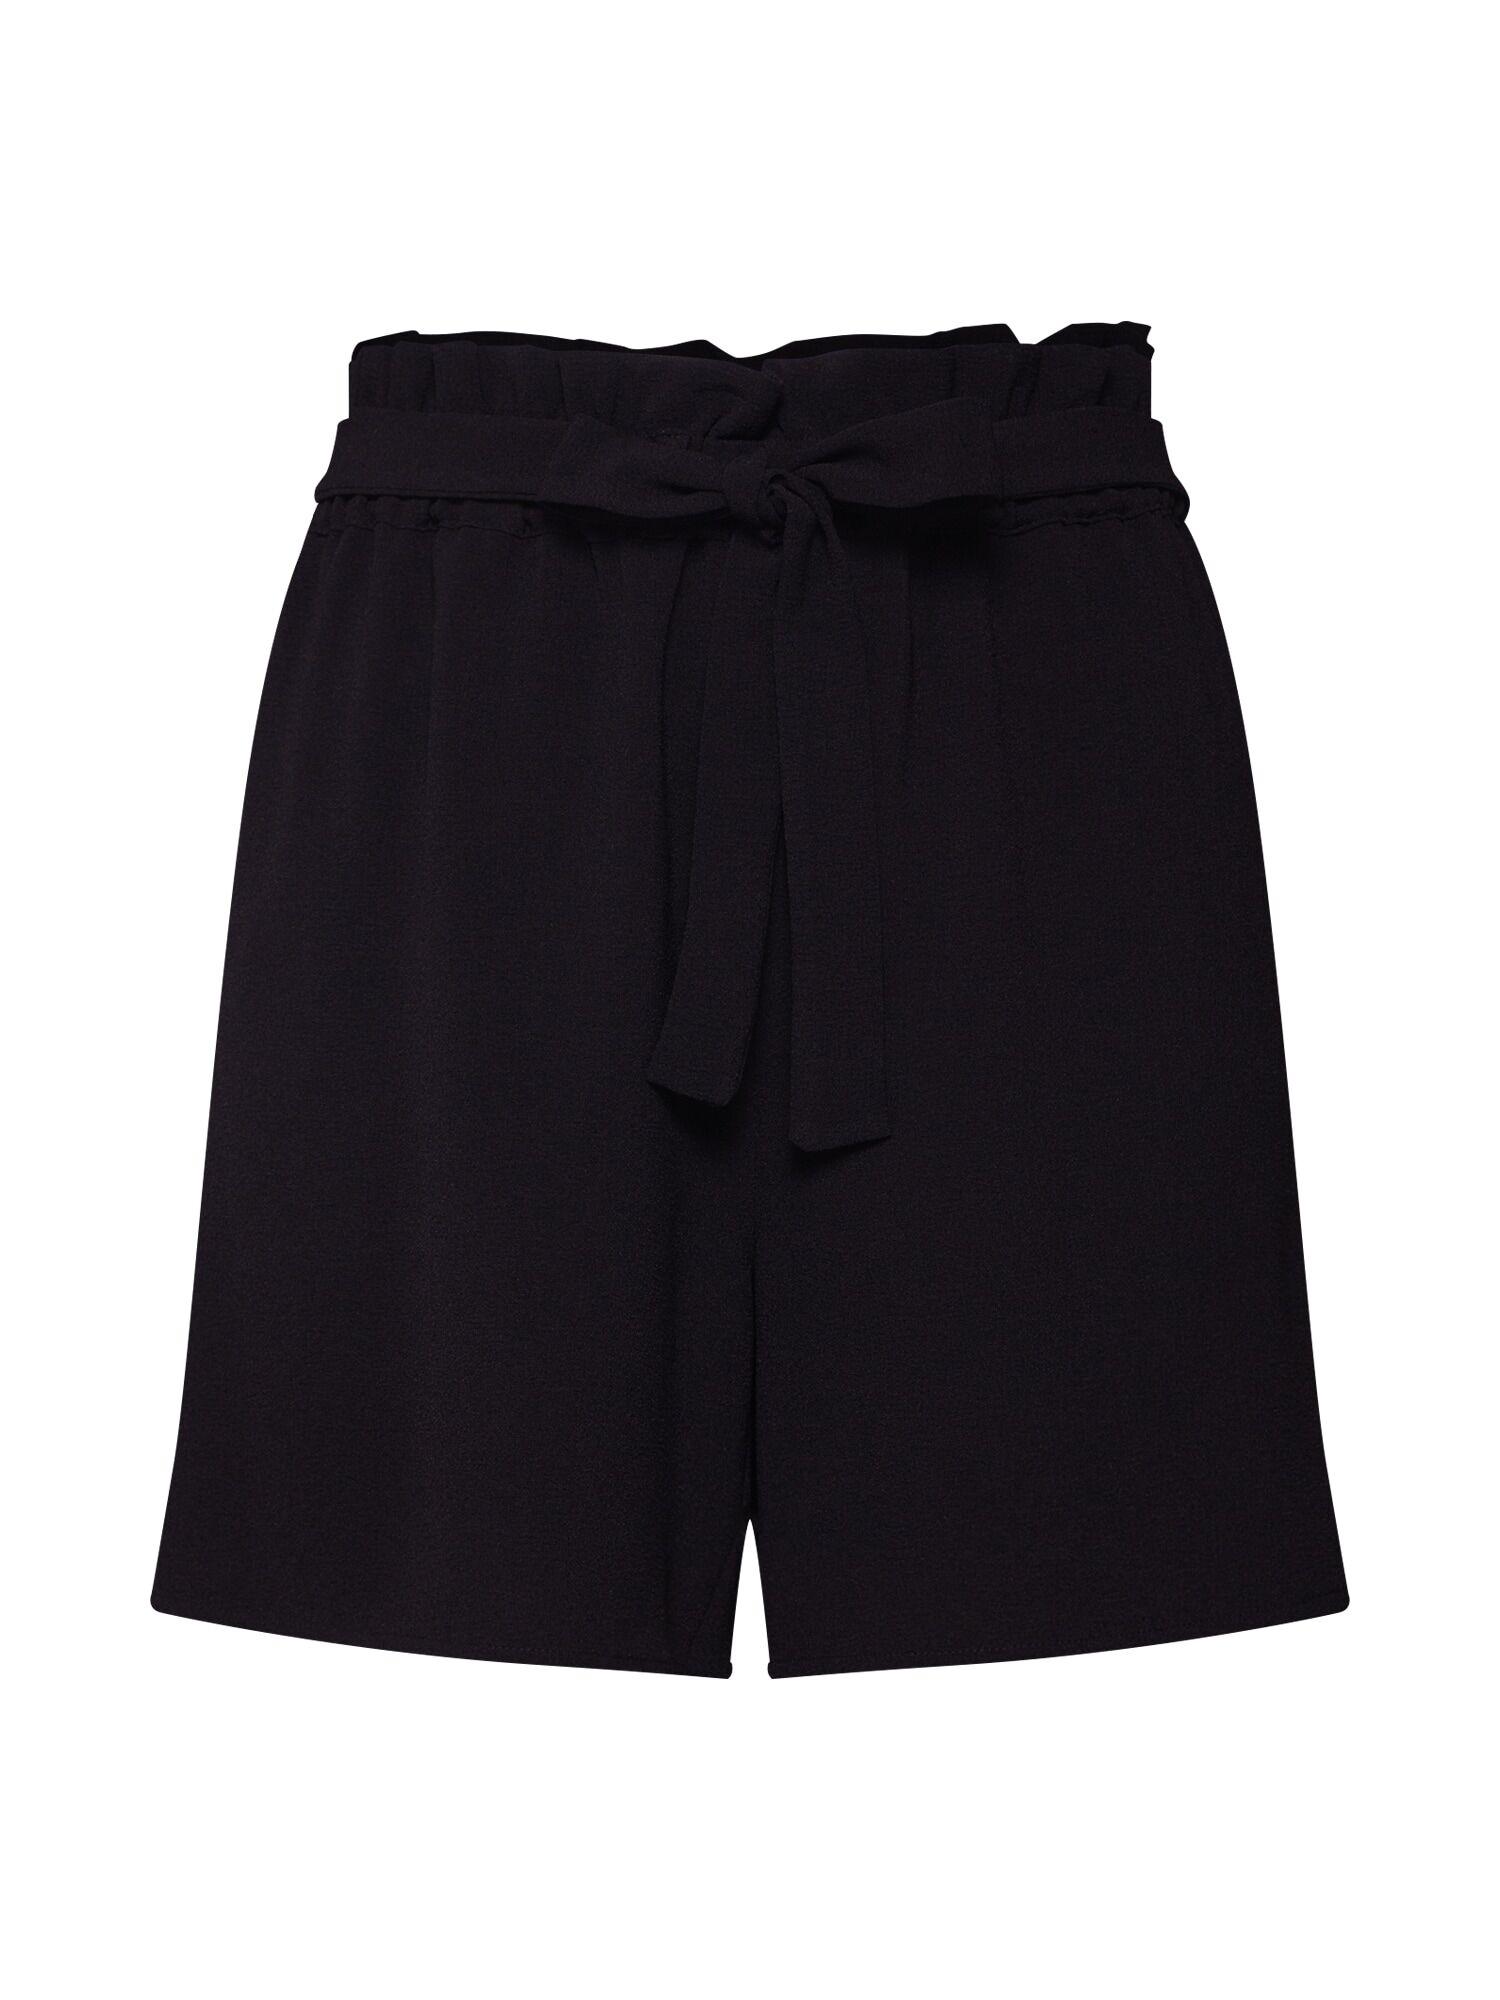 ONLY Pantalon à pince 'Turner'  - Noir - Taille: 34 - female